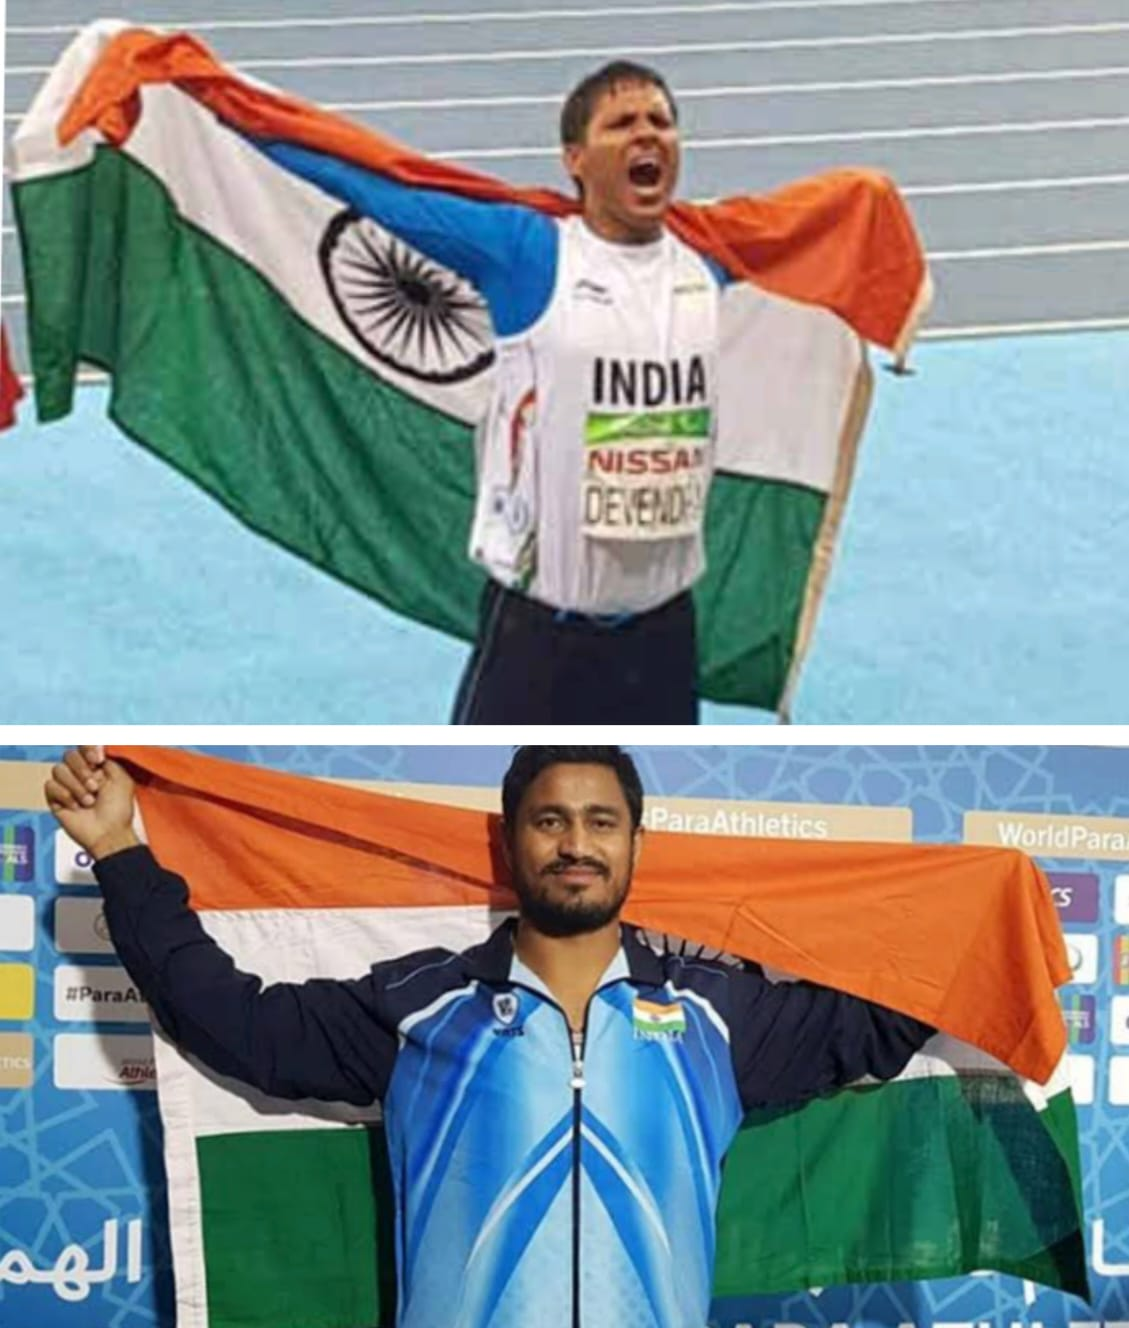 Know India's javelin throwers, Devendra Jhajharia & Singh Gurjar, who won silver & bronze in Paralympics